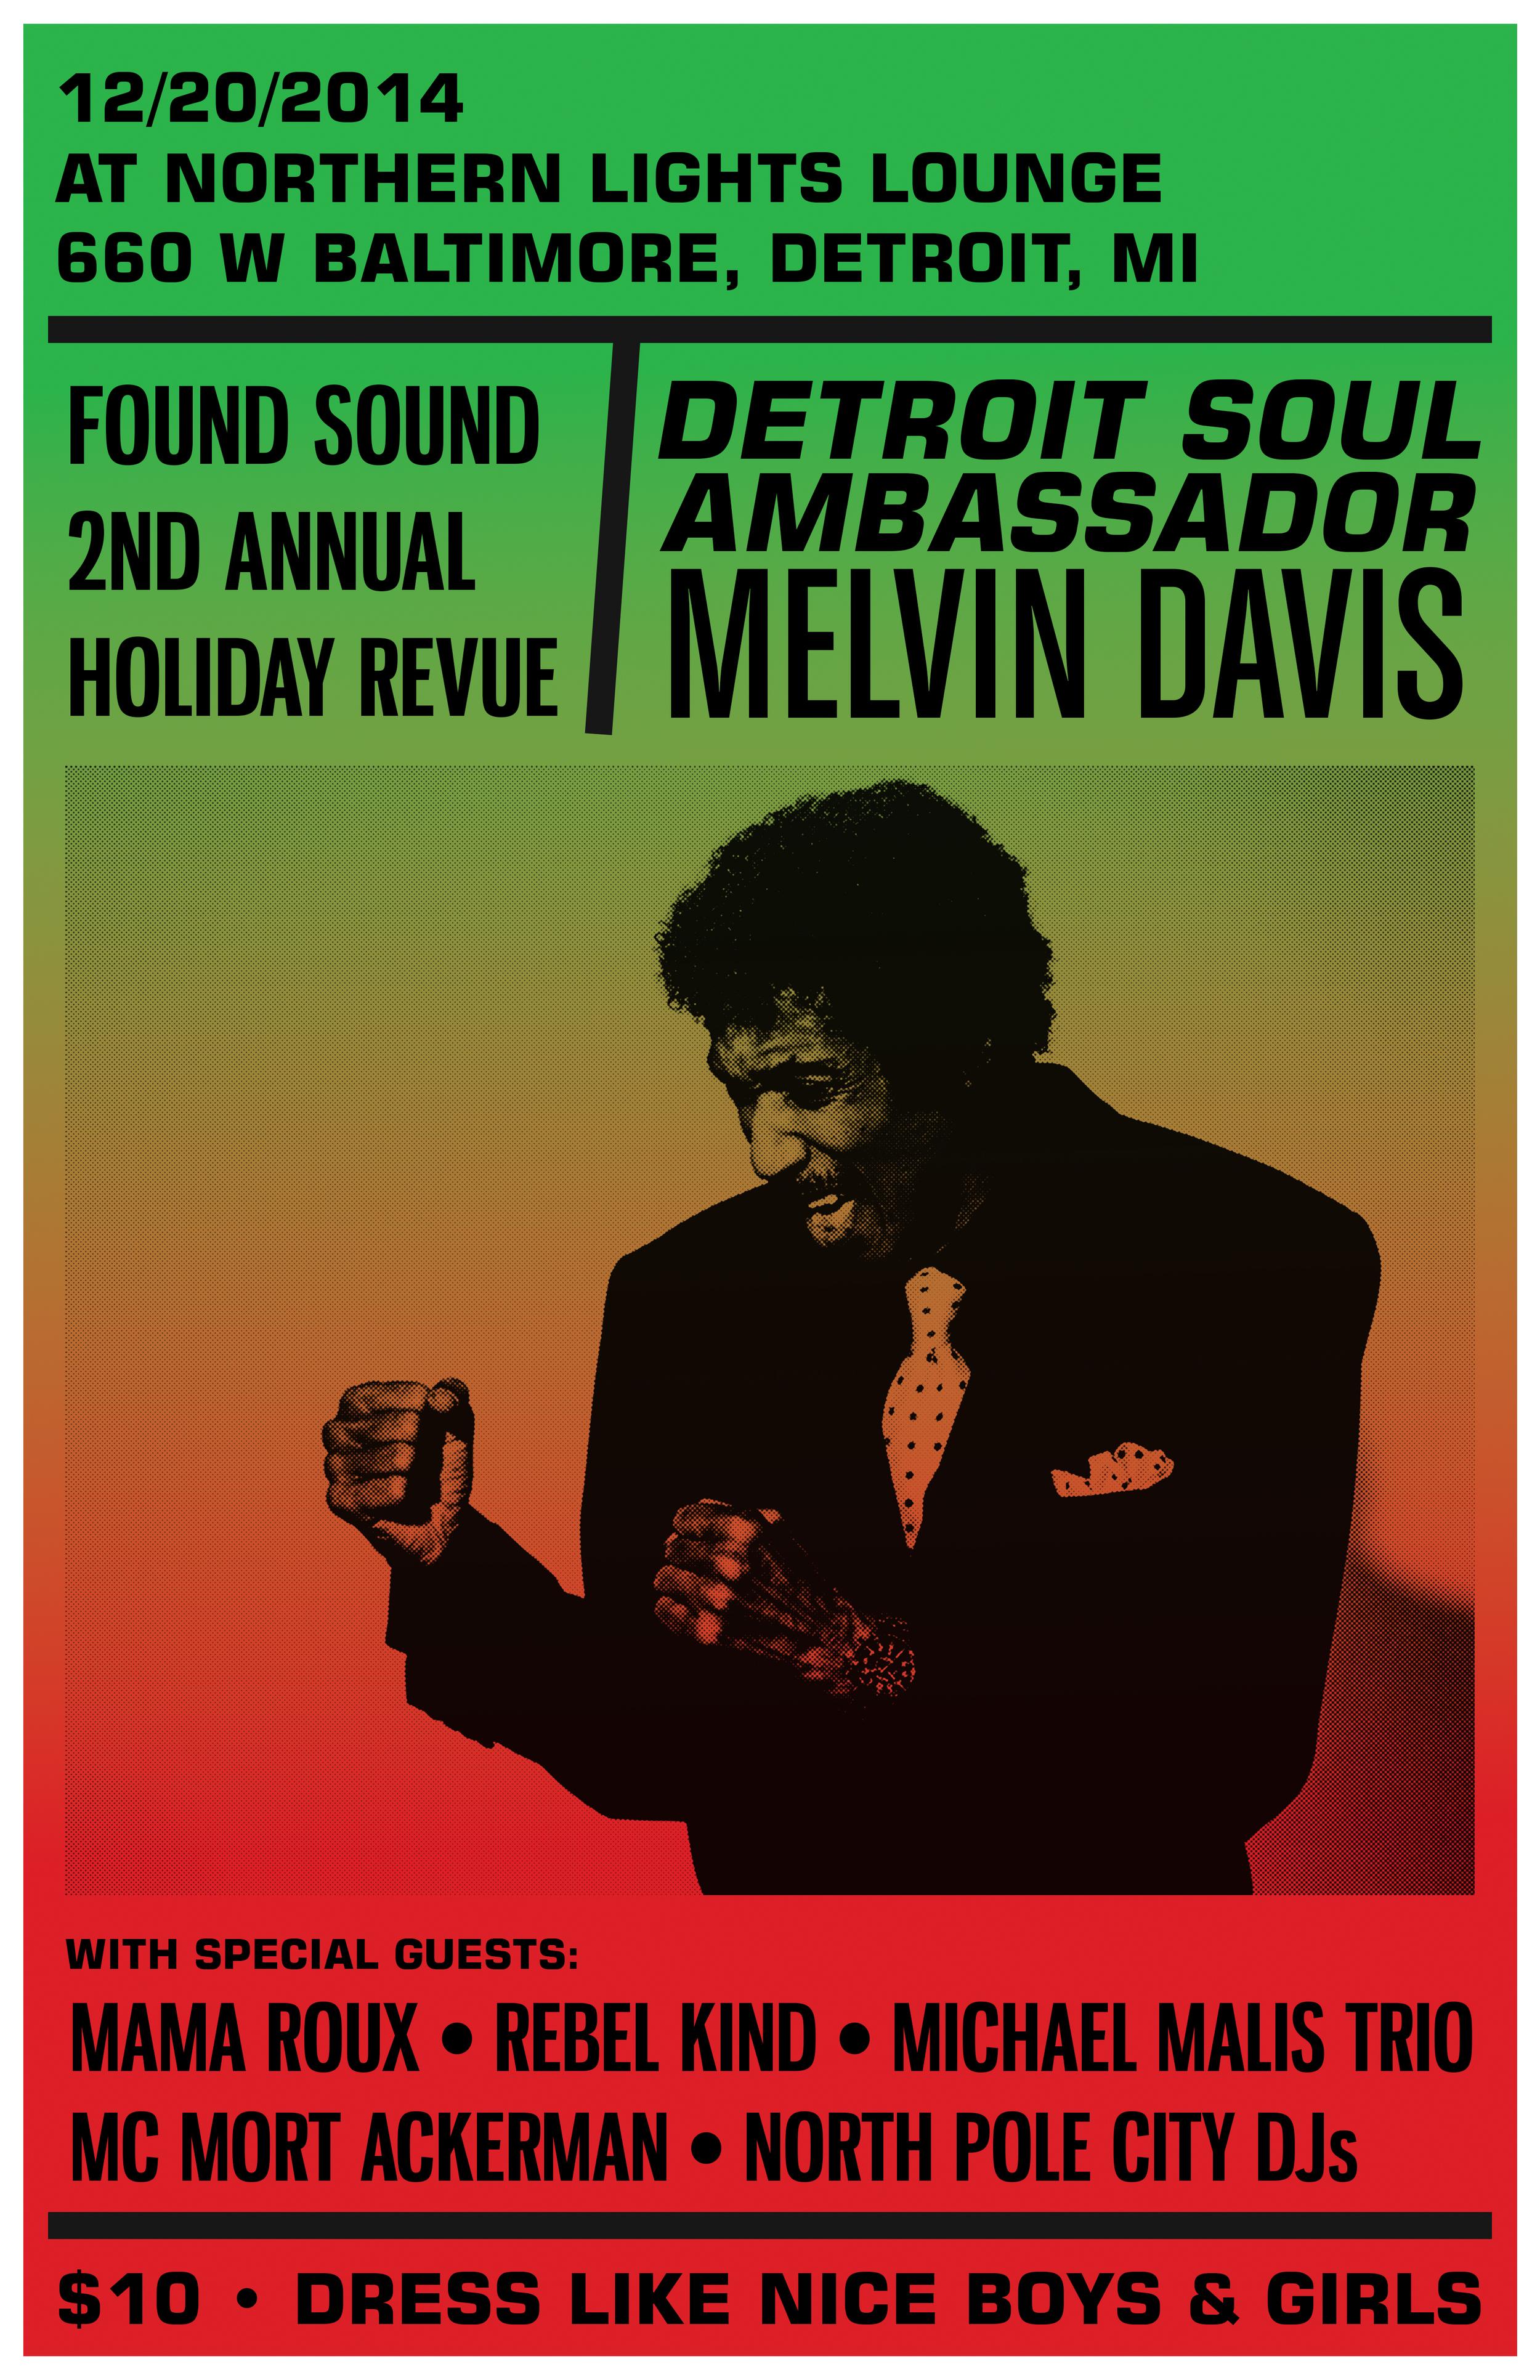 found sound holiday poster.jpg